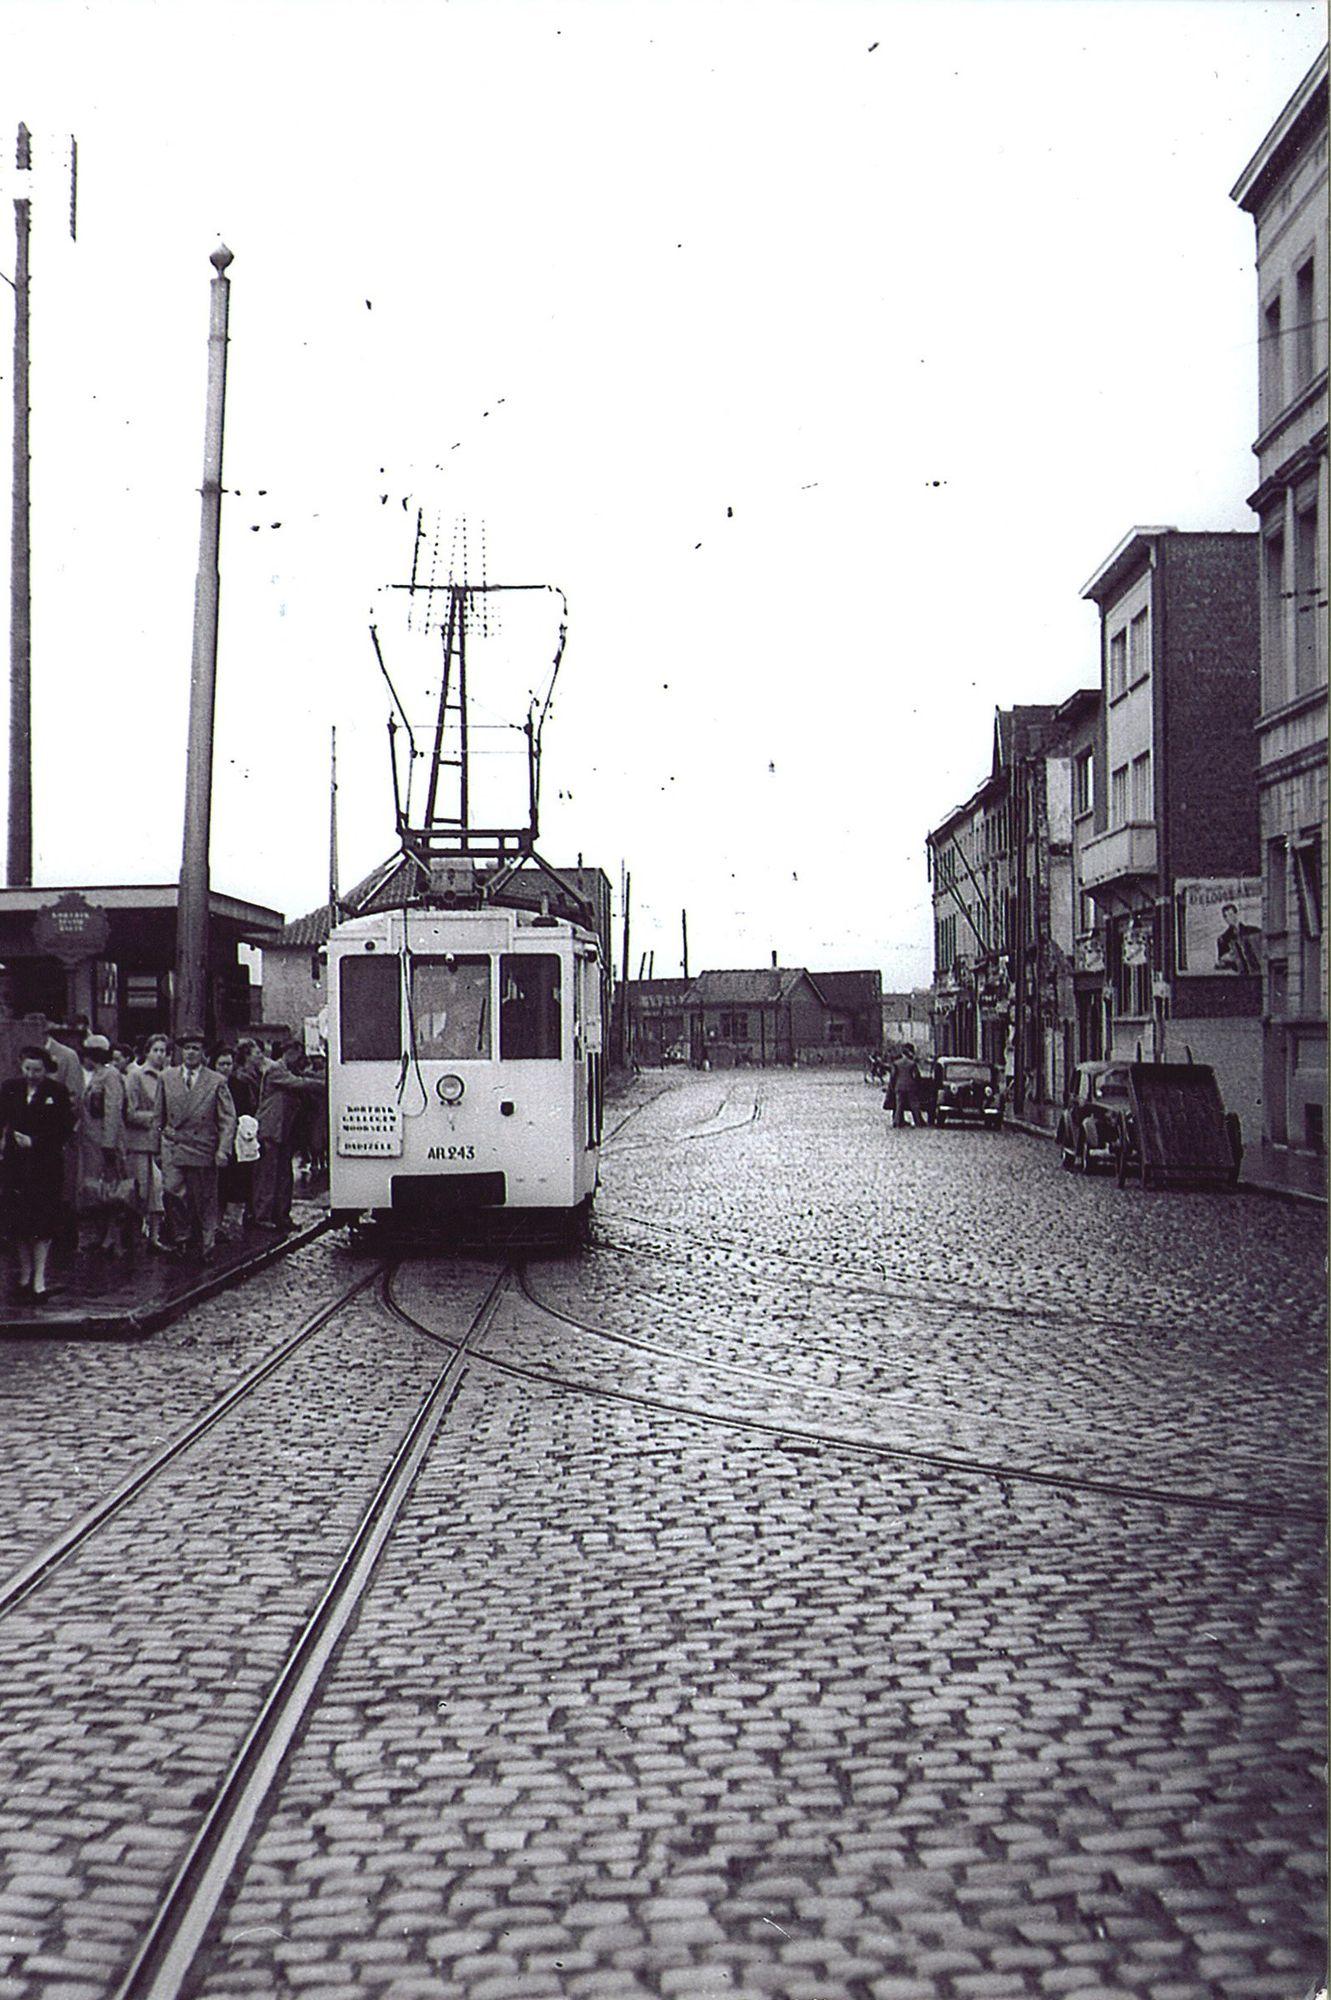 Trams in Kortrijk